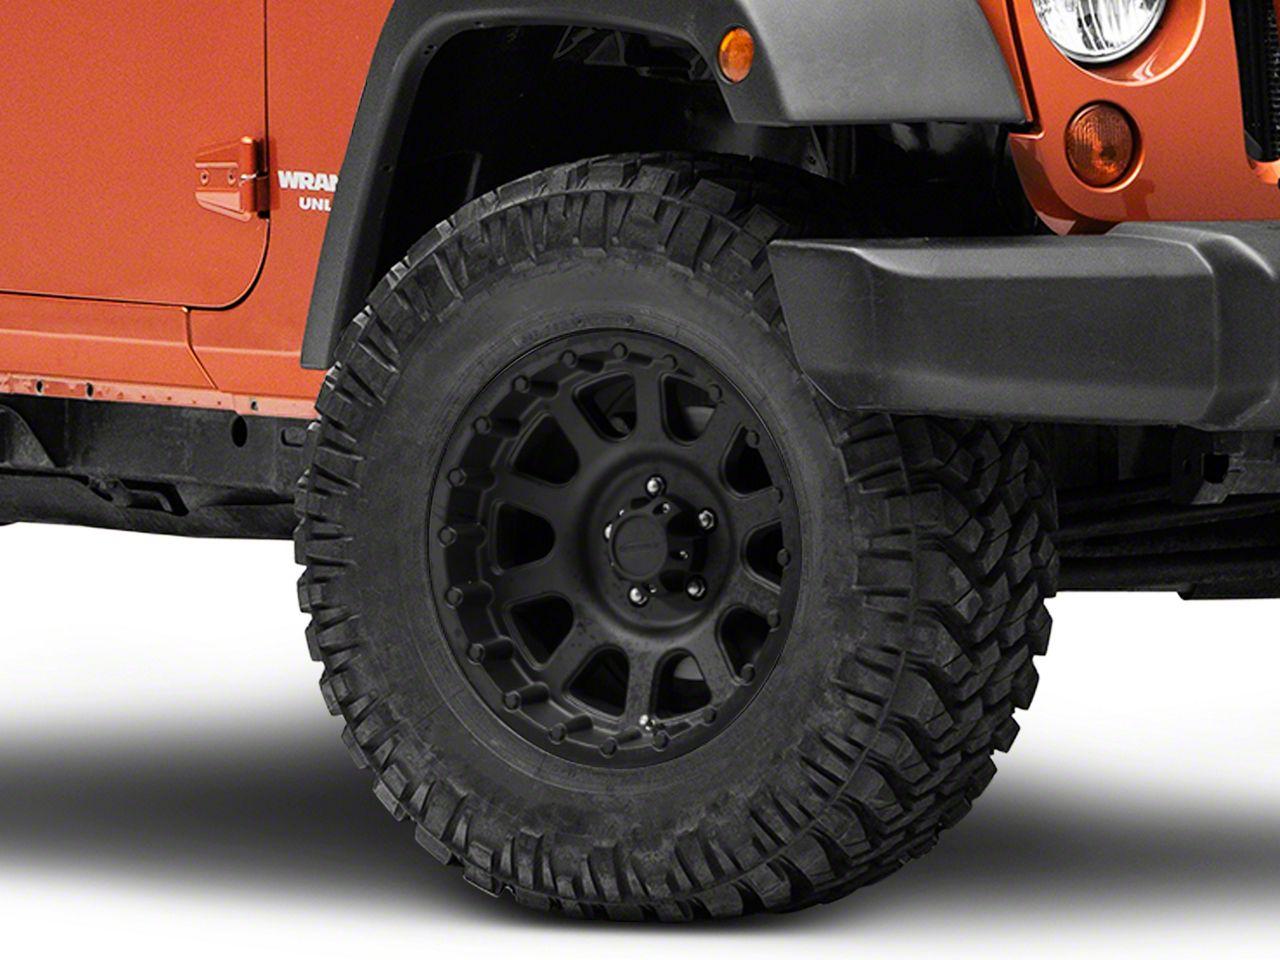 Pro Comp Wheels Alloy Series 7032 Flat Black Wheel - 17x9 (07-18 Jeep Wrangler JK)